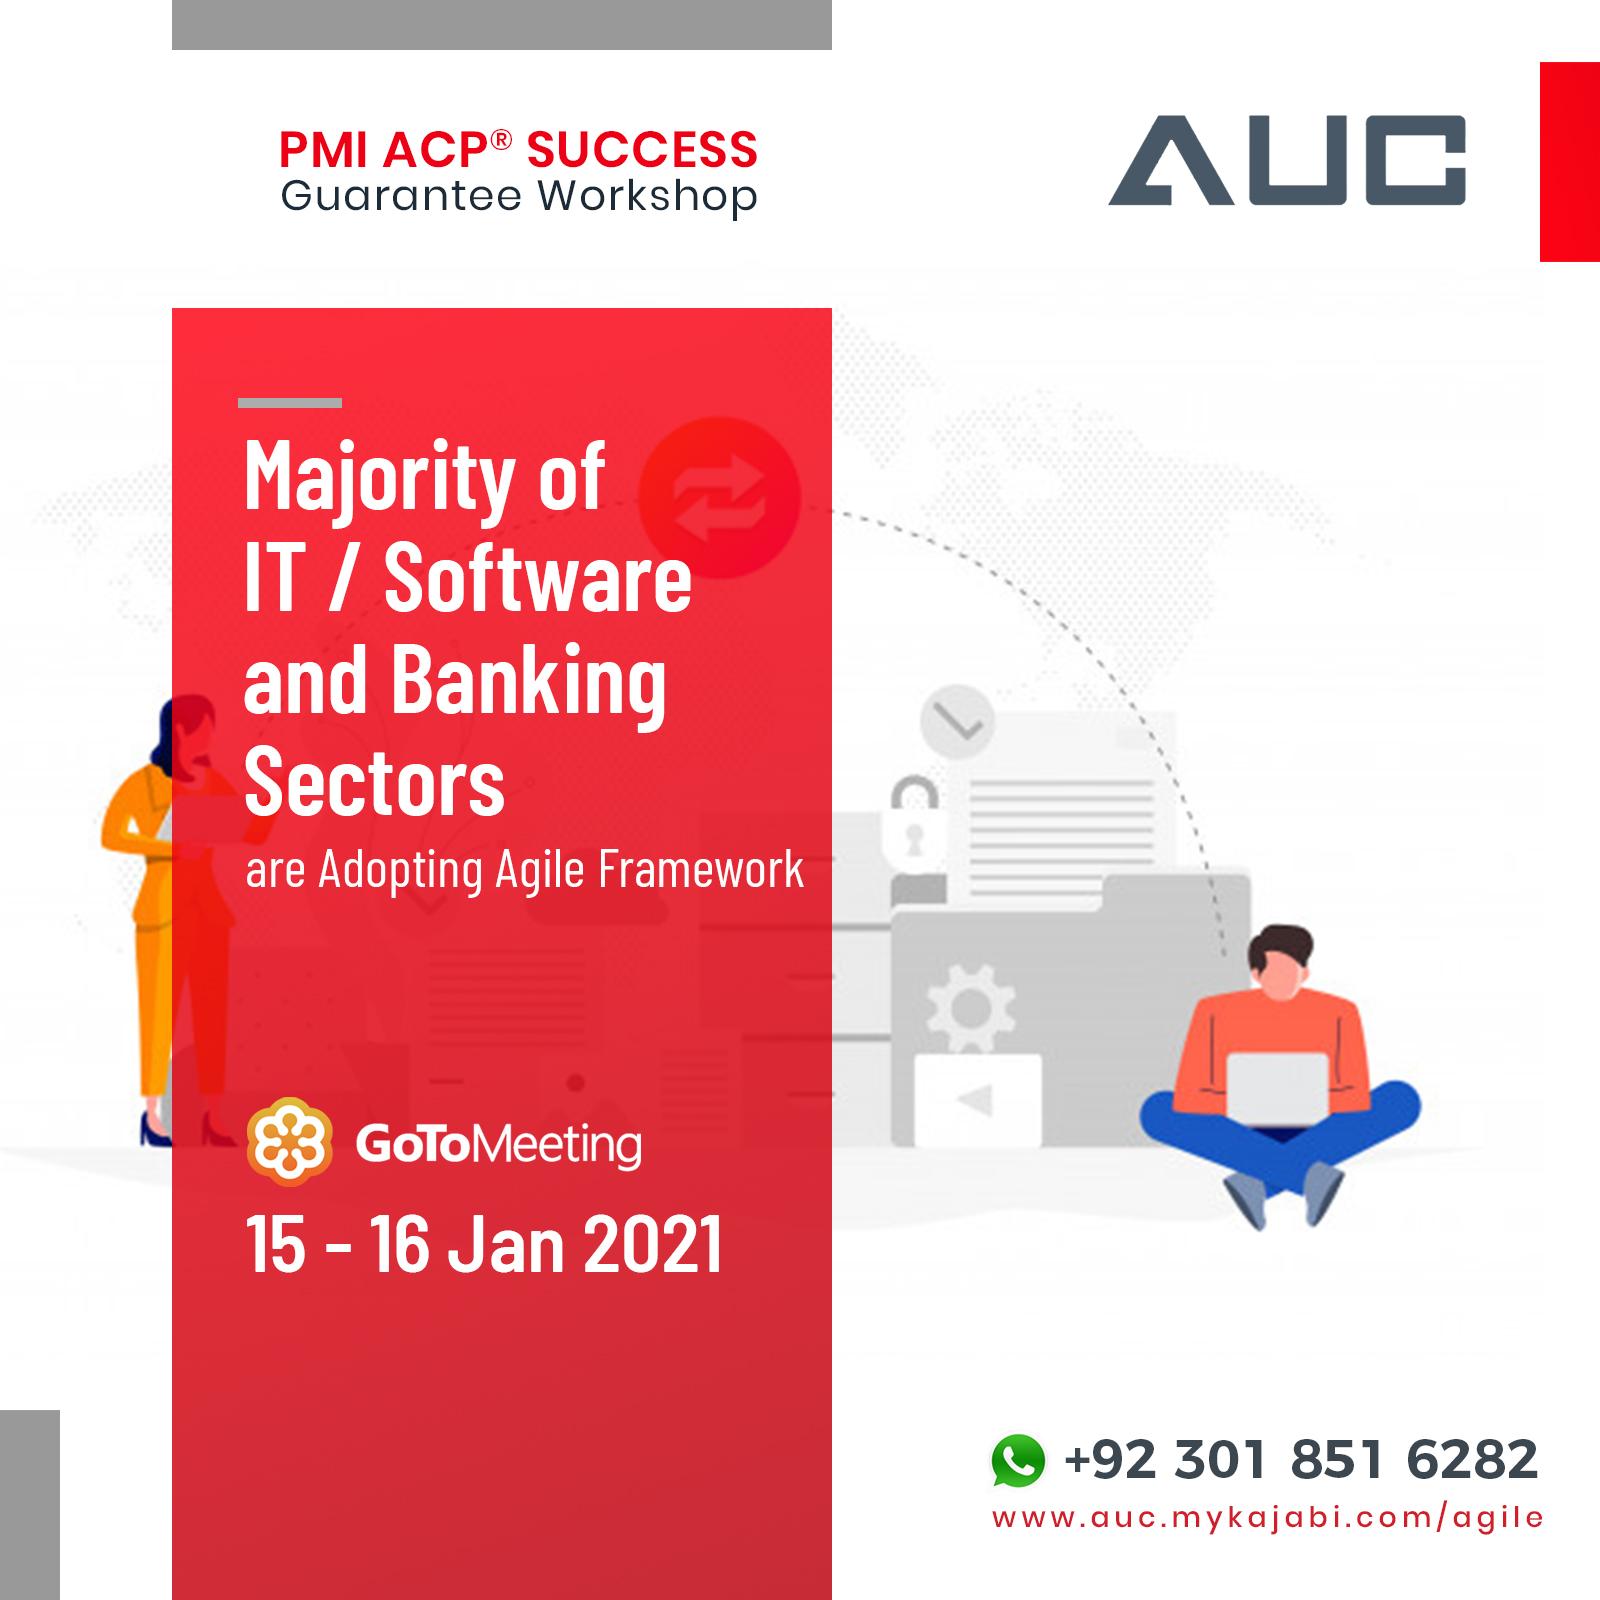 Social Media Marketing AUC Technologies for Agile